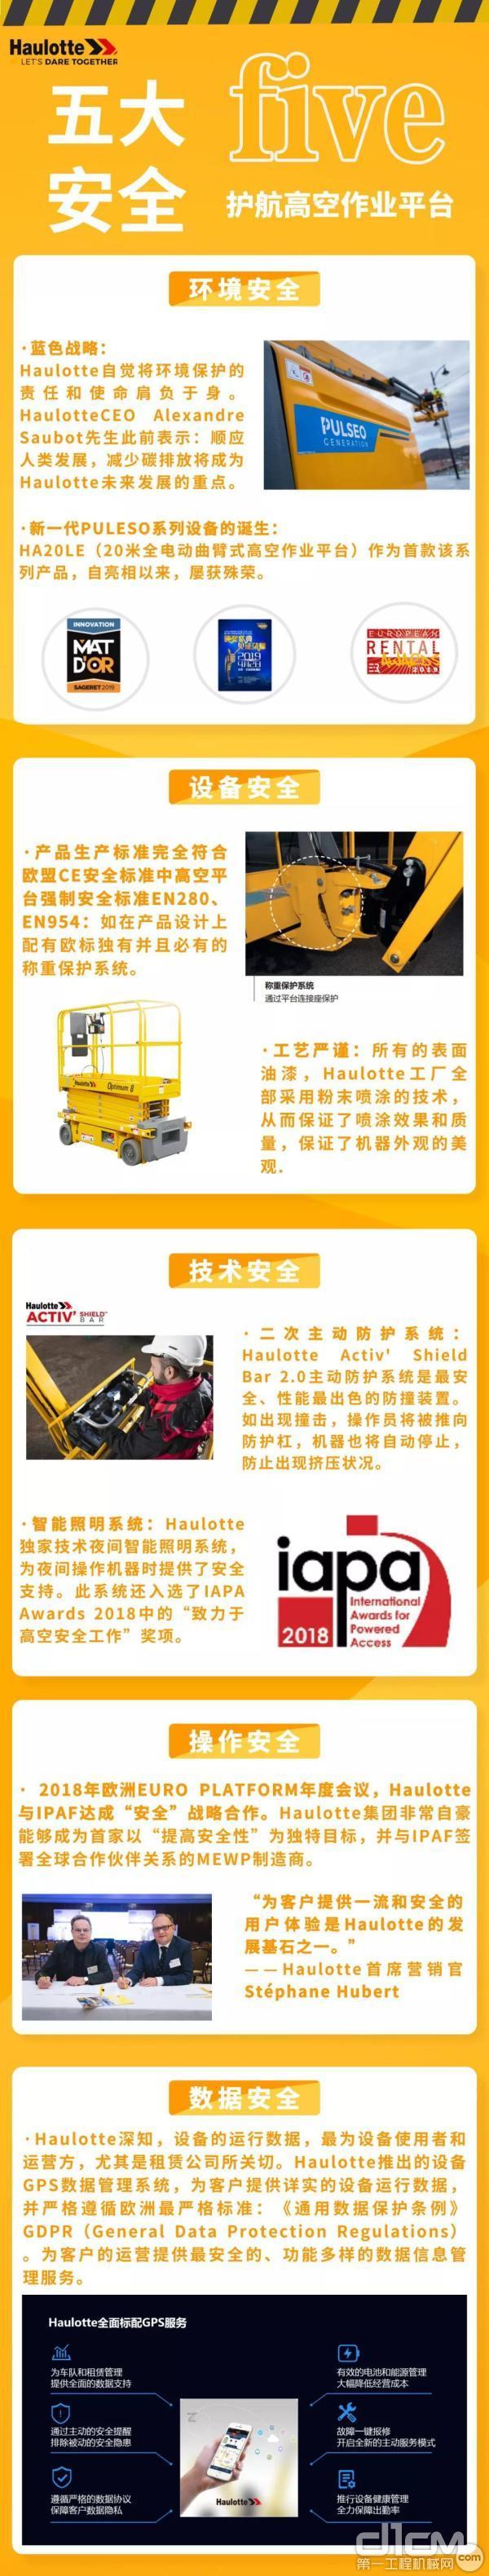 "Haulotte ""五大安全""护航高空作业平台"